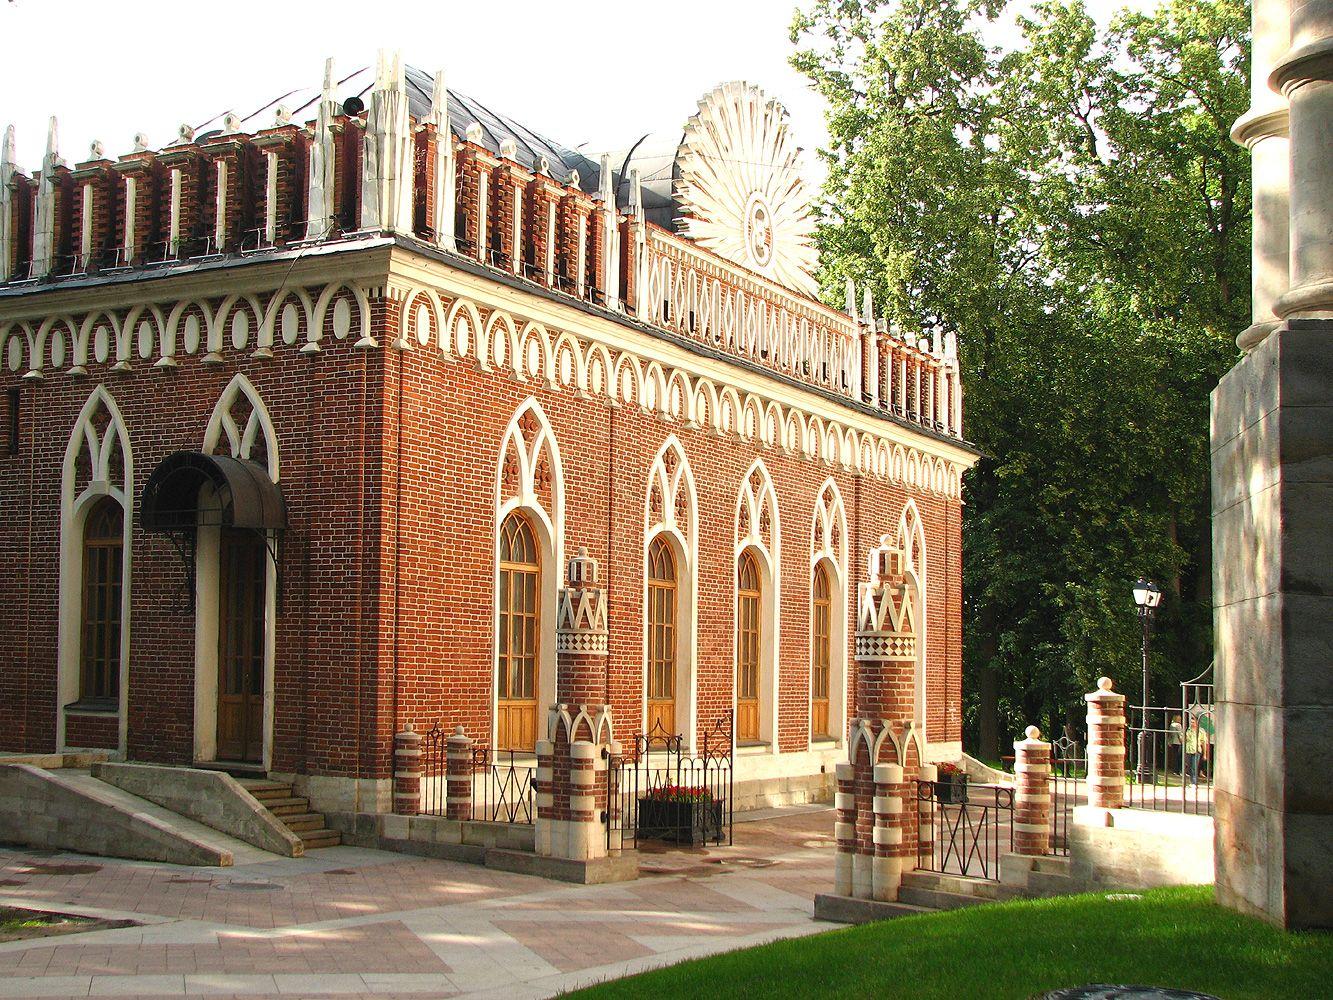 Petit Palais - Tsaritsyno - Construit de 1776 à 1778 par Vassily Bajenov.